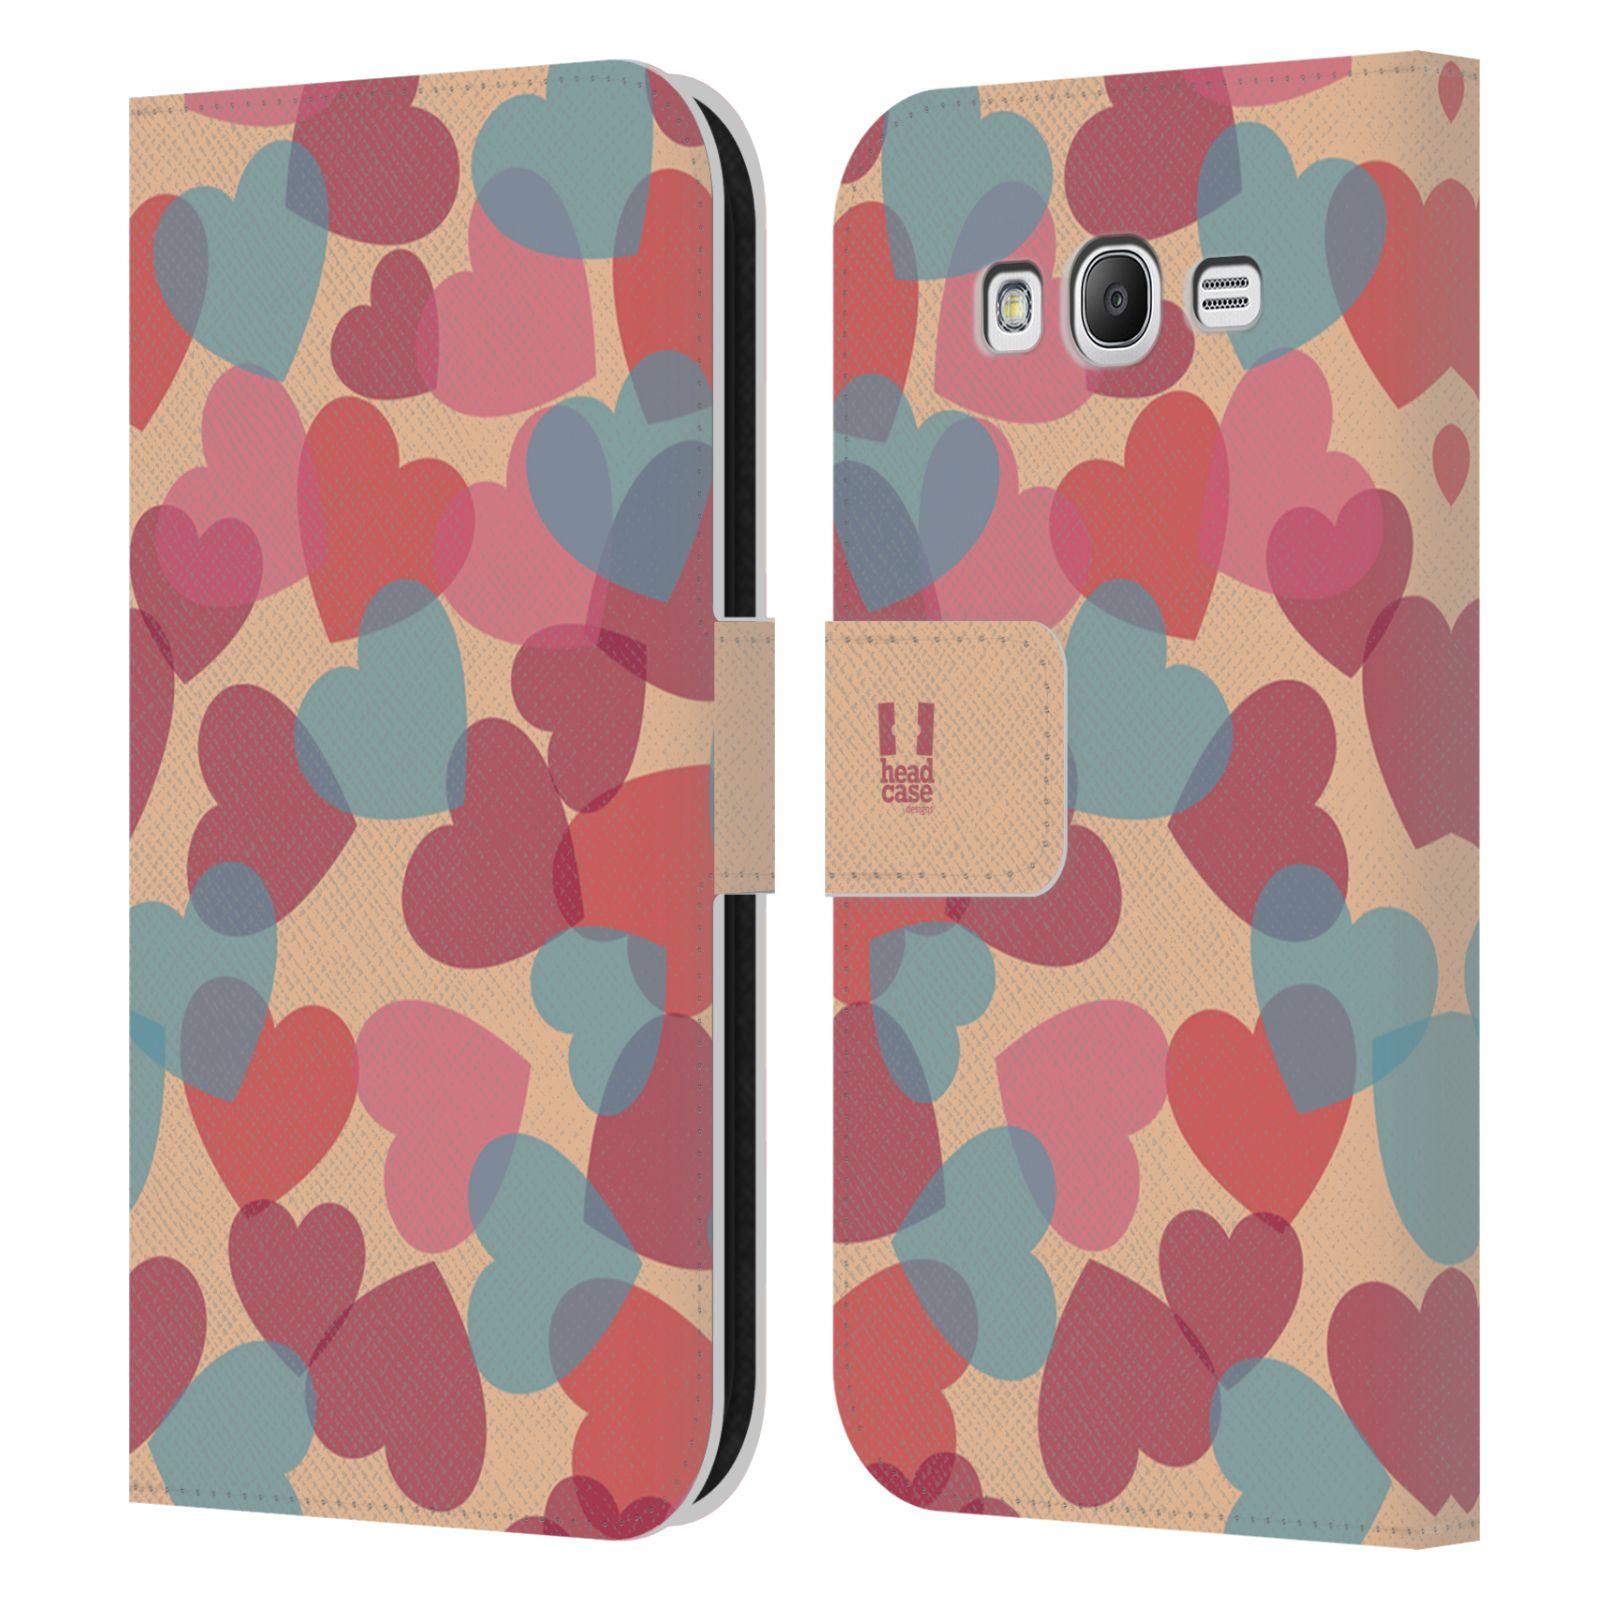 HEAD CASE Flipové pouzdro pro mobil Samsung Galaxy Grand i9080 vzor prolínající se srdíčka, srdce, láska, růžová